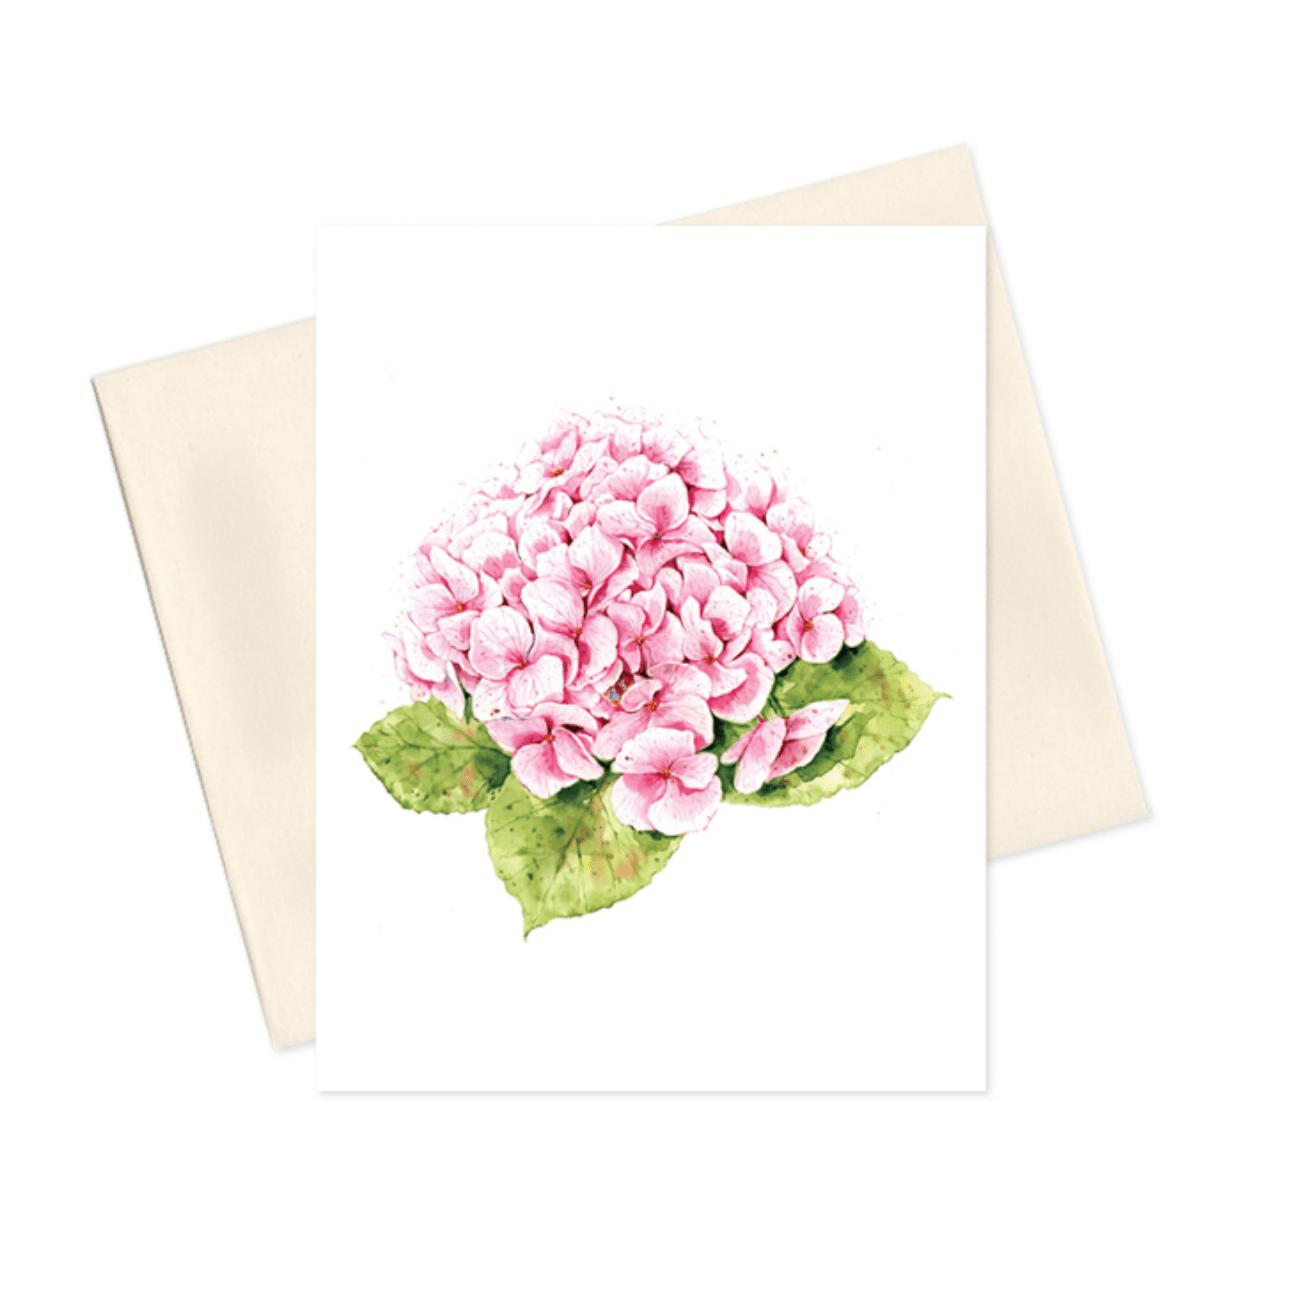 Amanda Strand's pink hydrangea greeting card